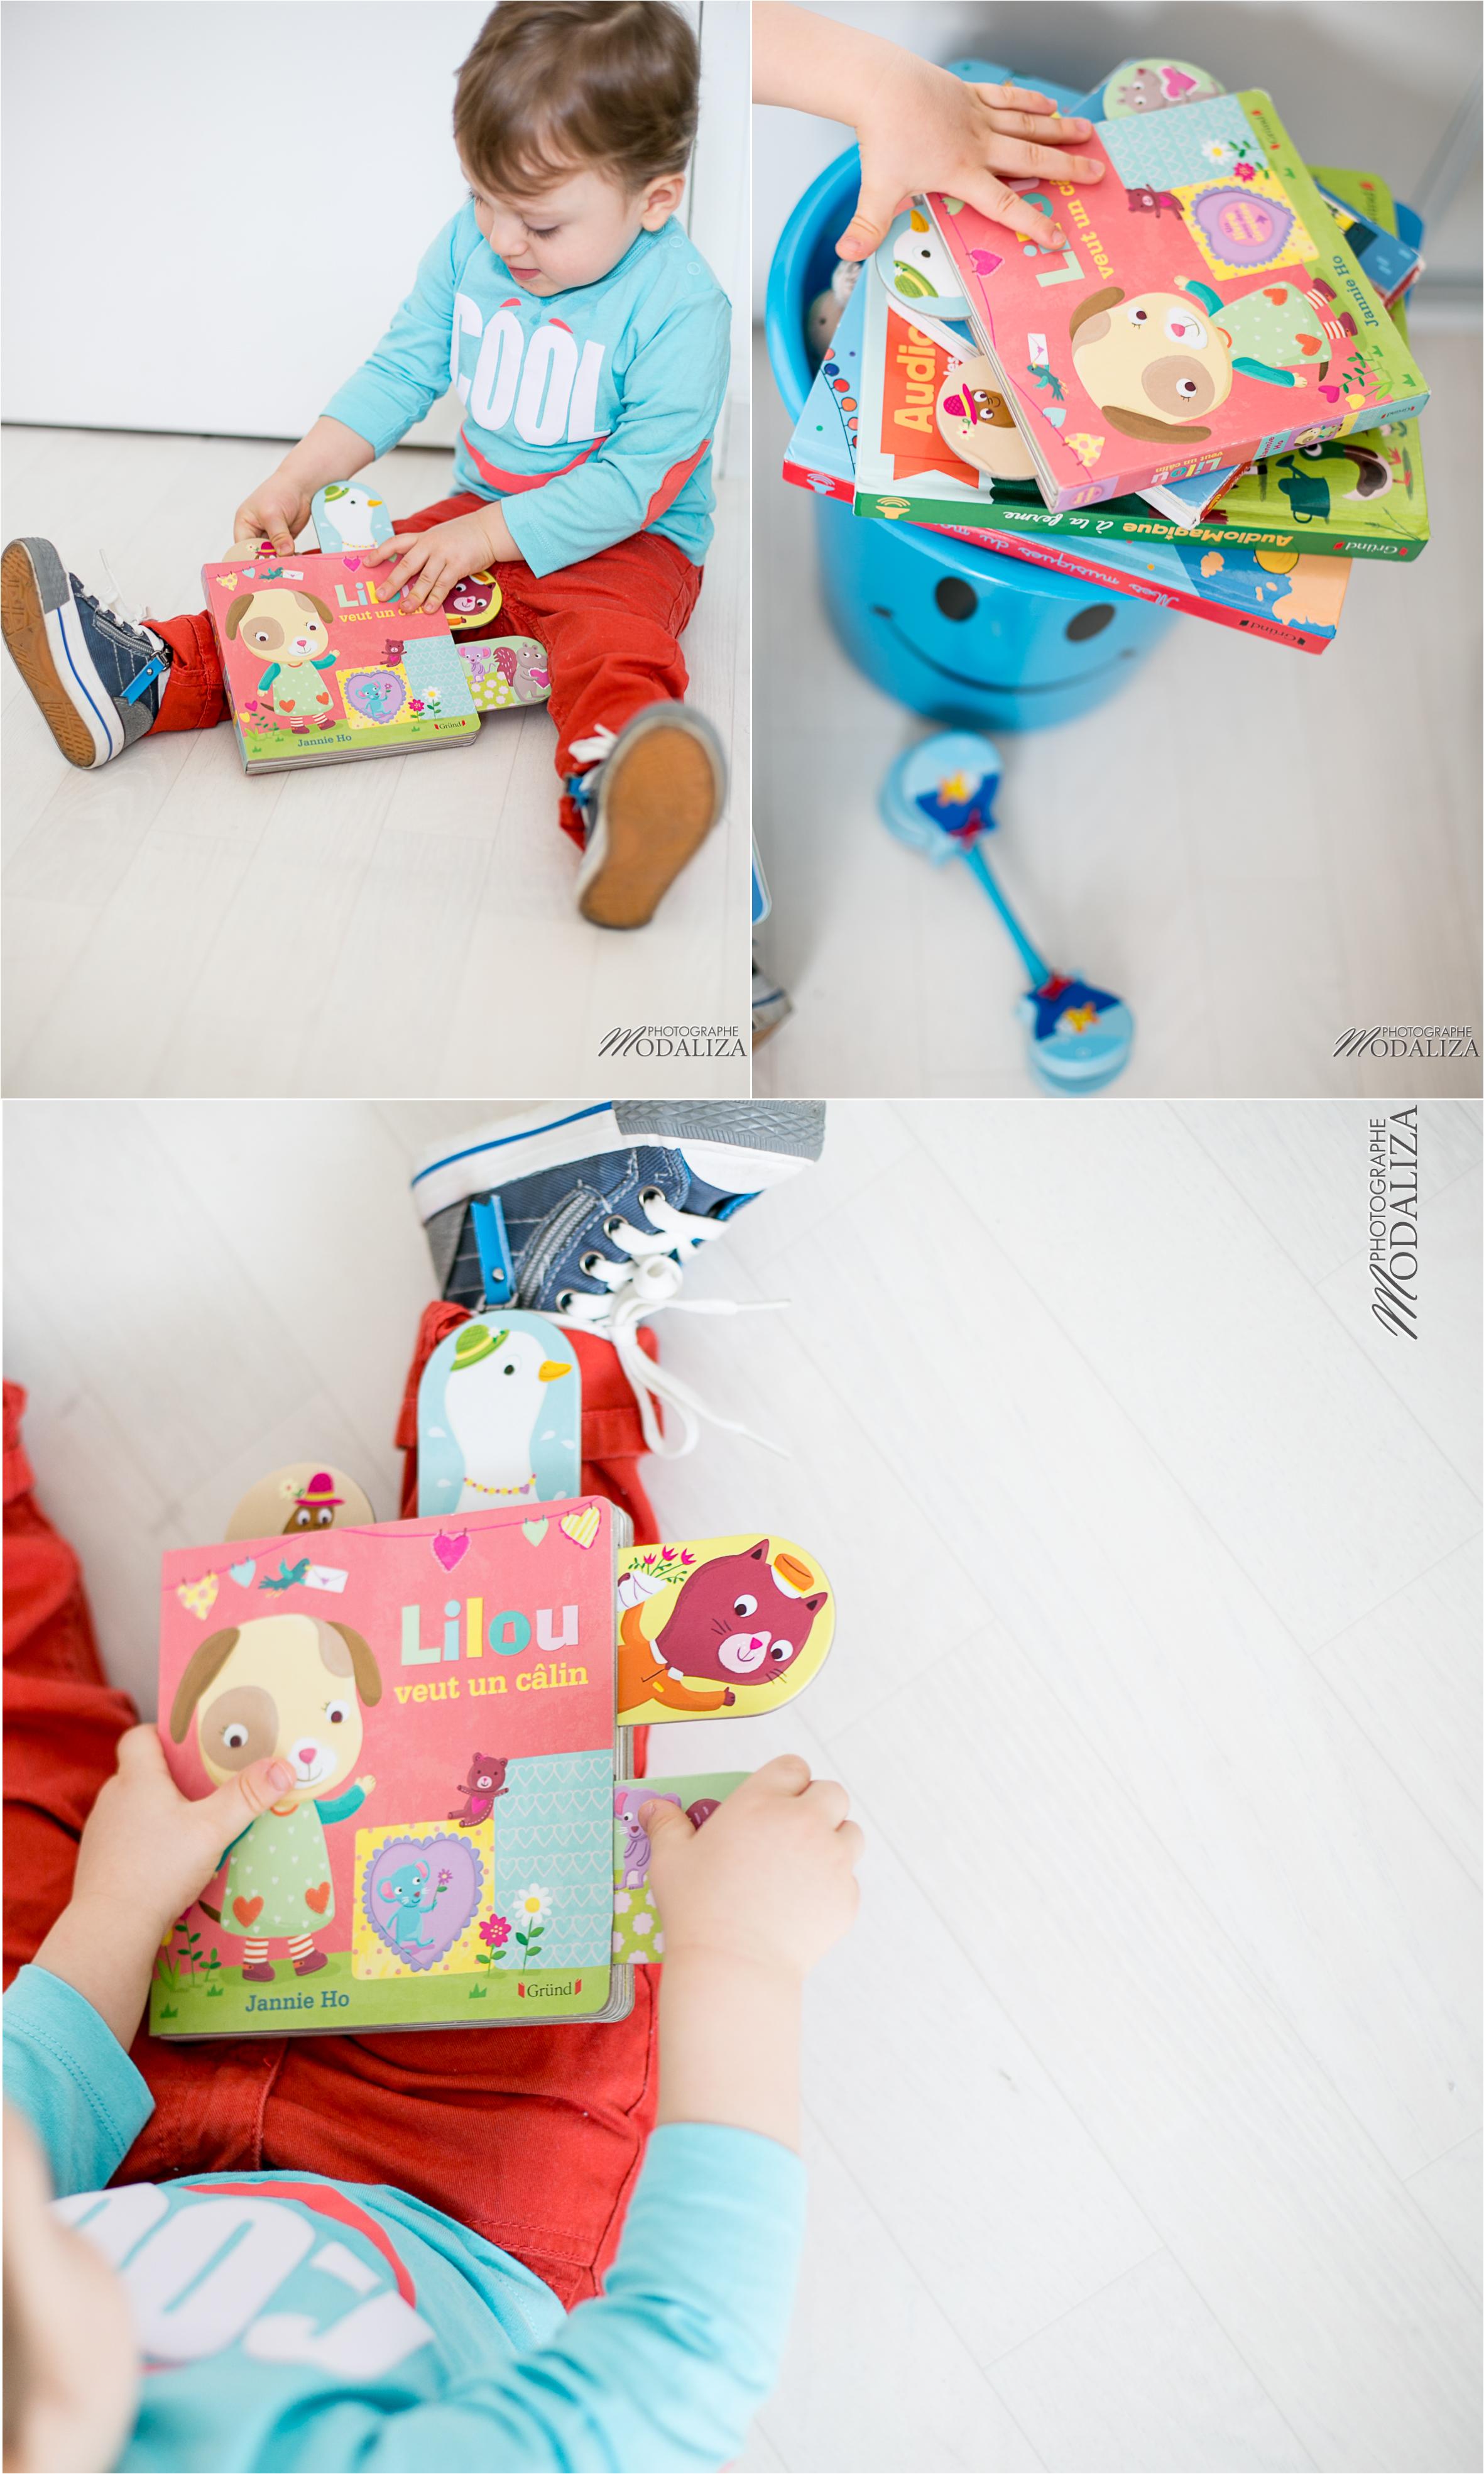 photo fashion baby boy maman blogueuse test livre musical grund play time lifestyle kid look kiabi by modaliza photographe